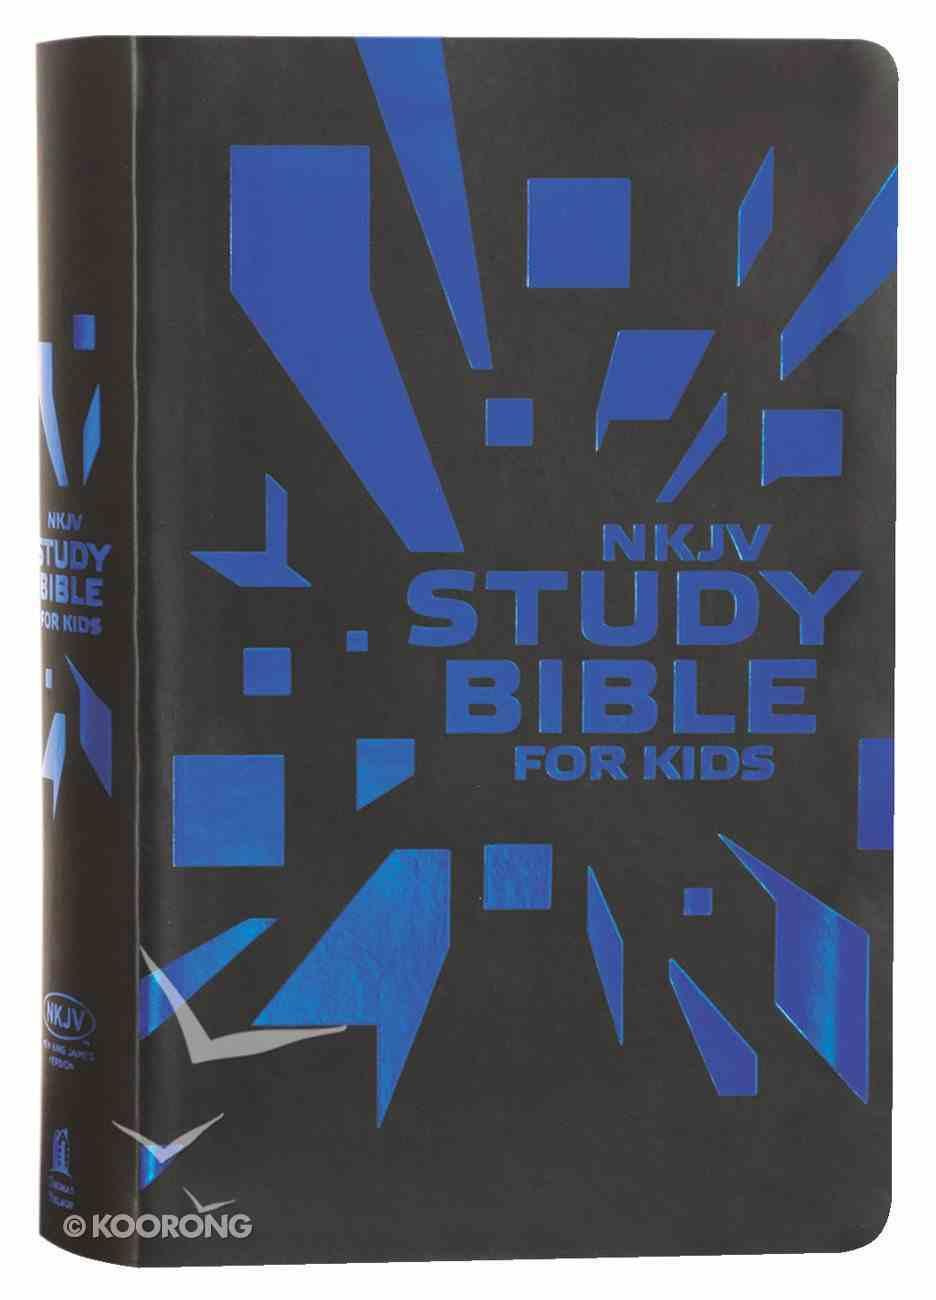 NKJV Study Bible For Kids Grey/Blue Cover (Black Letter Edition) Premium Imitation Leather